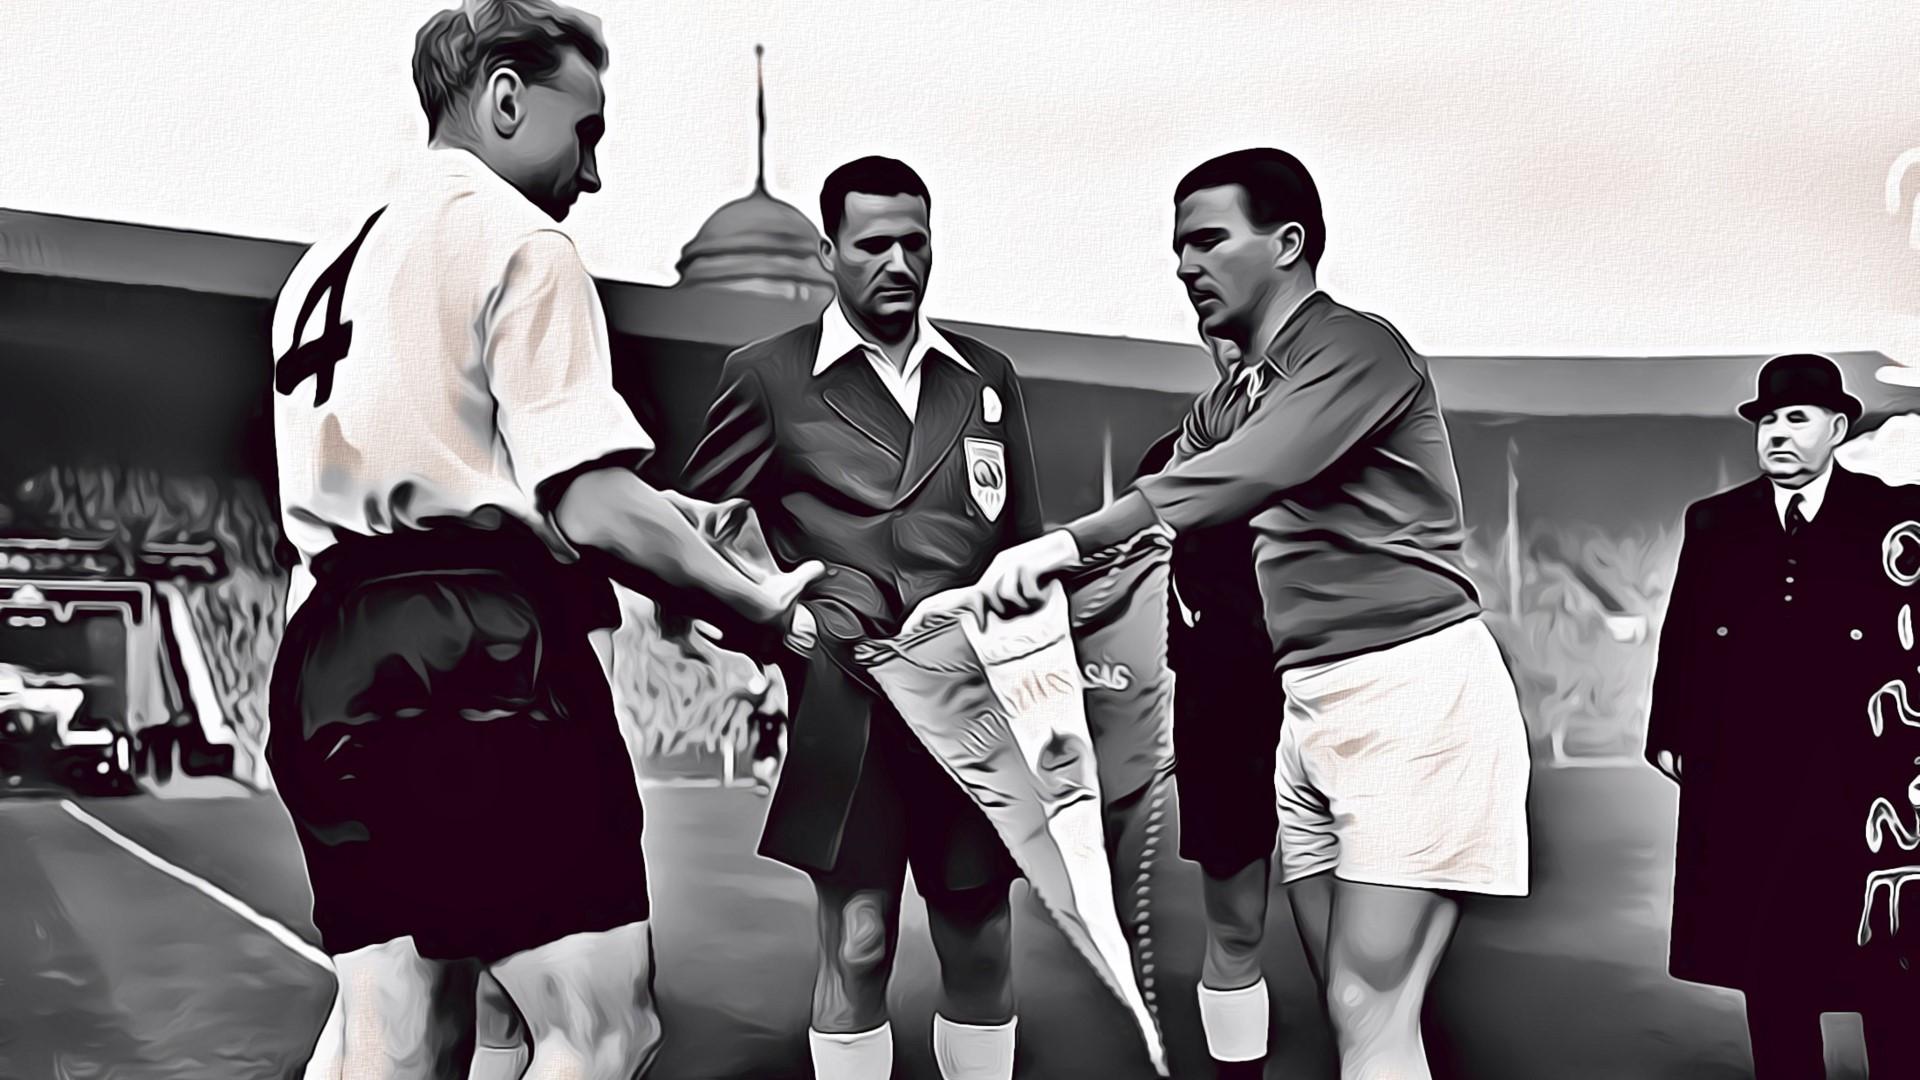 Hungary v England.jpg 2